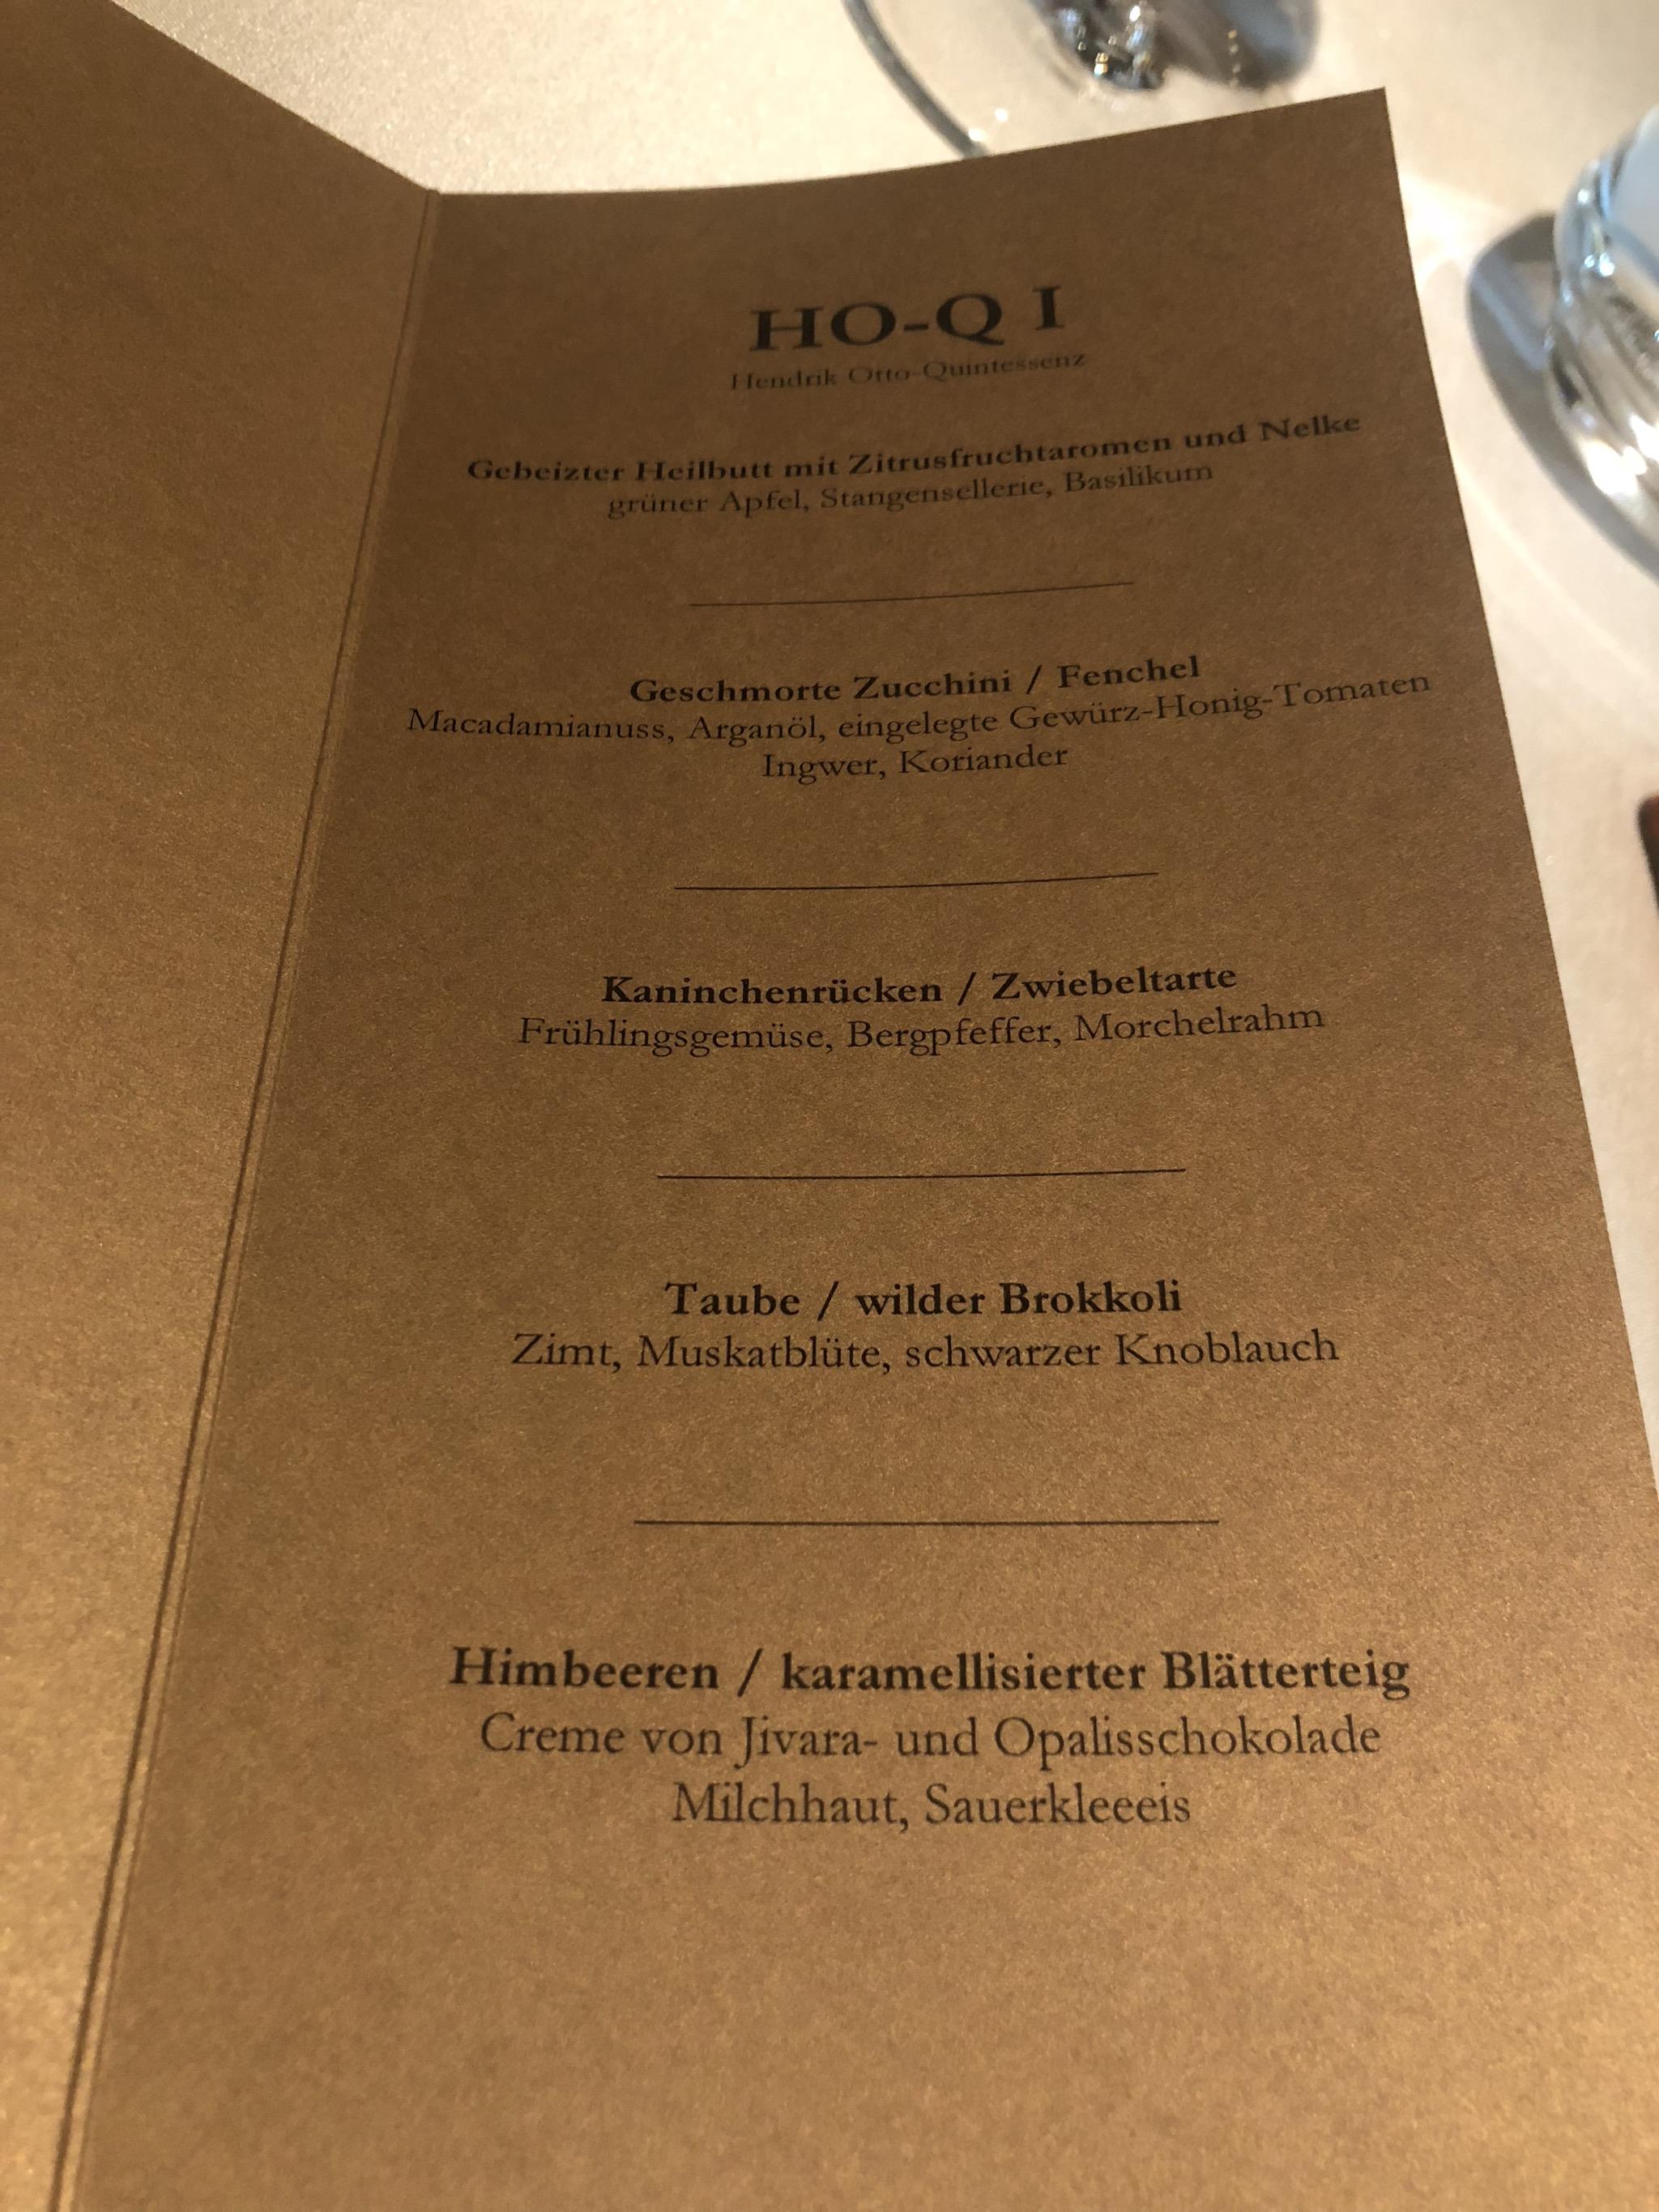 The chosen degustation menu HO-Q1